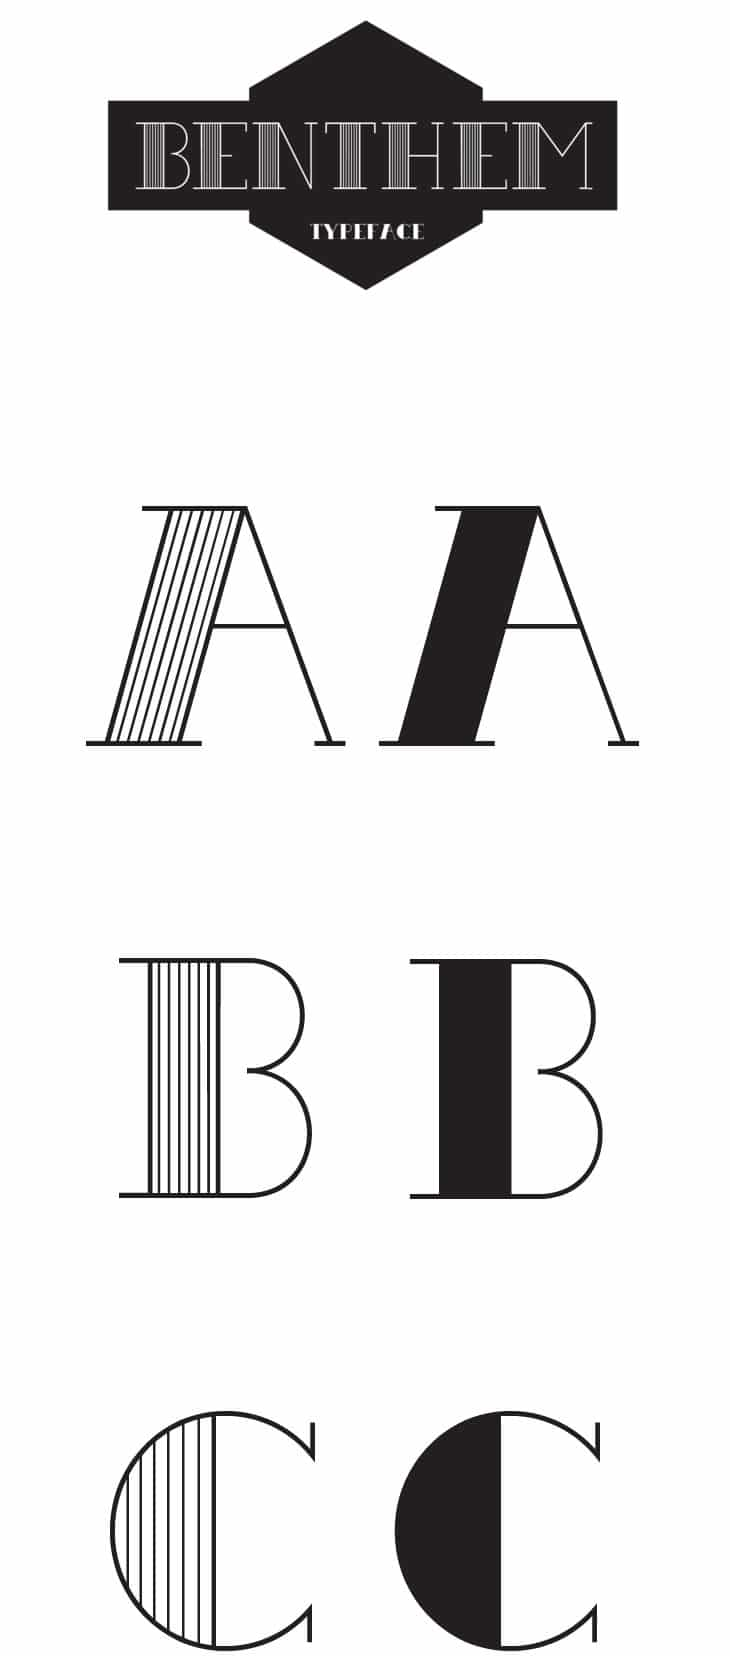 Benthem-Free-Typeface